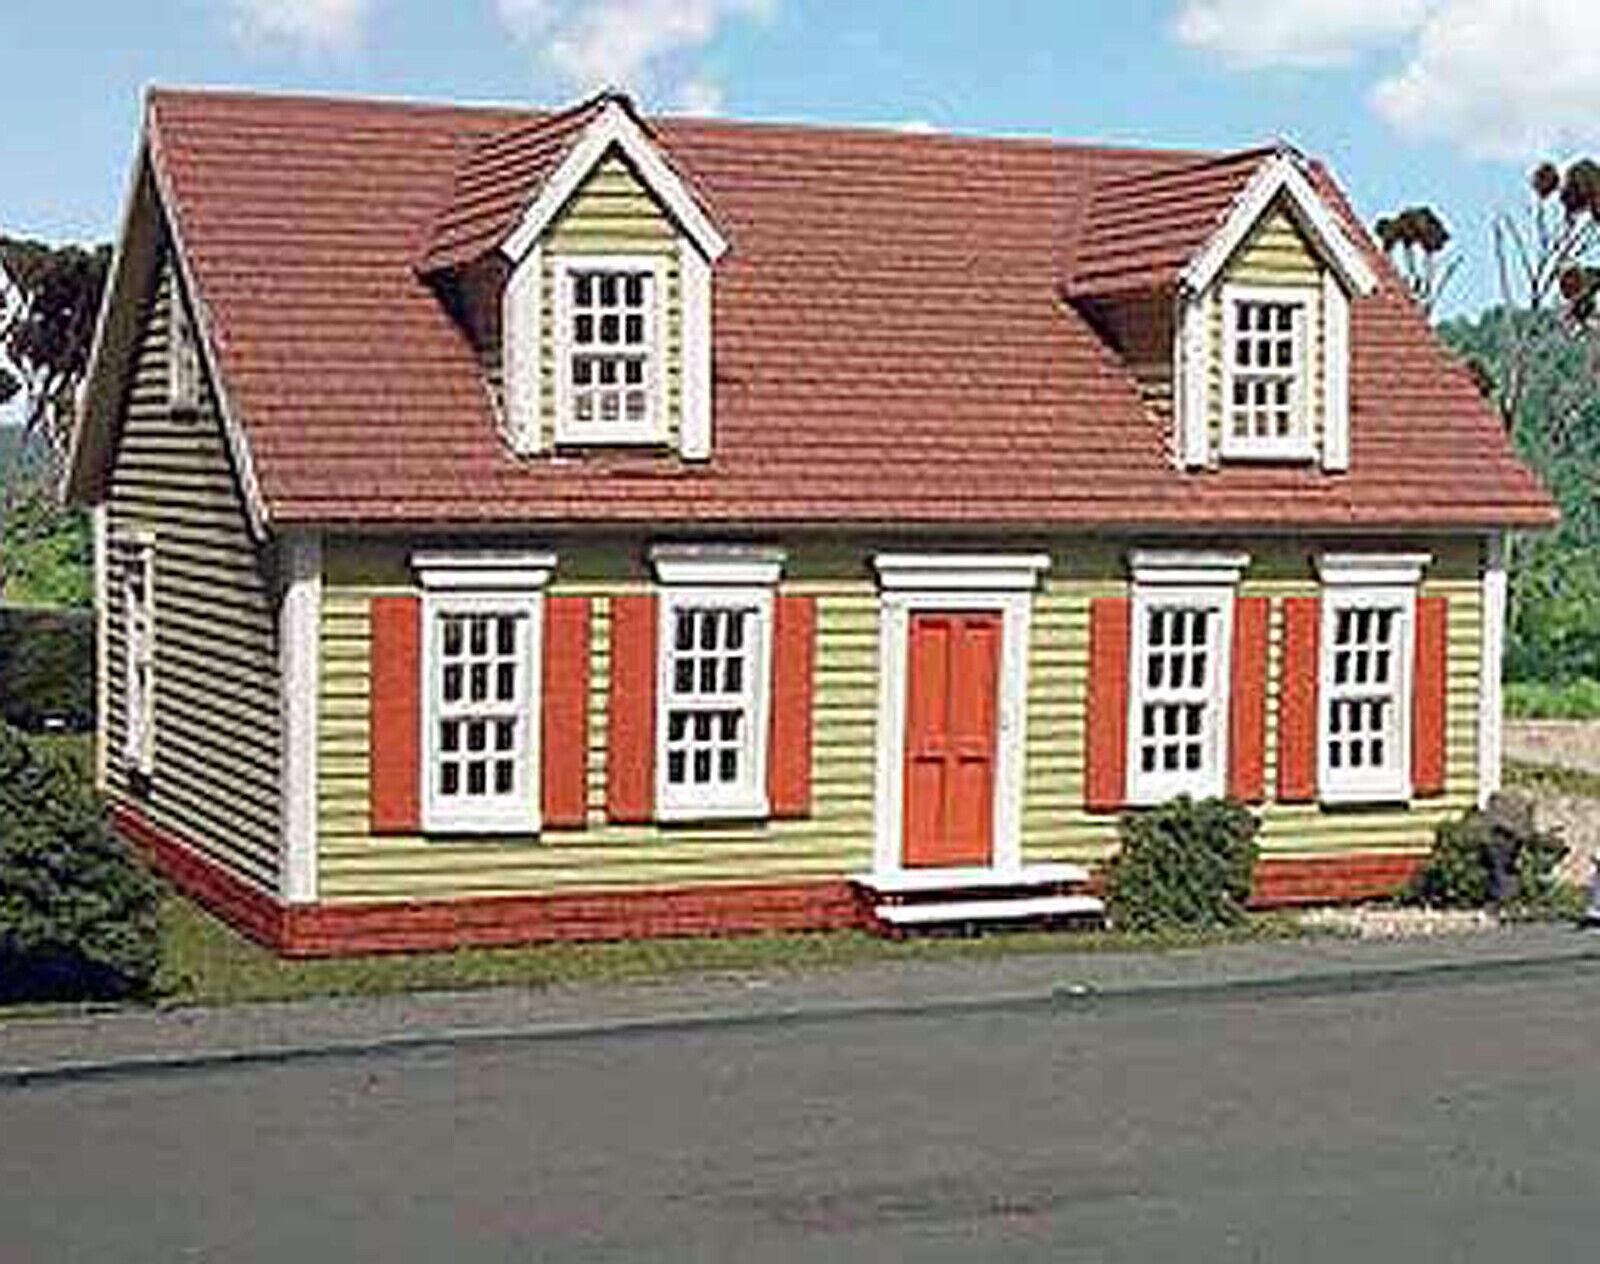 MAXWELL HOUSE HO Historic modellolo Railstrada Structure Unpainted Laser Kit LA610